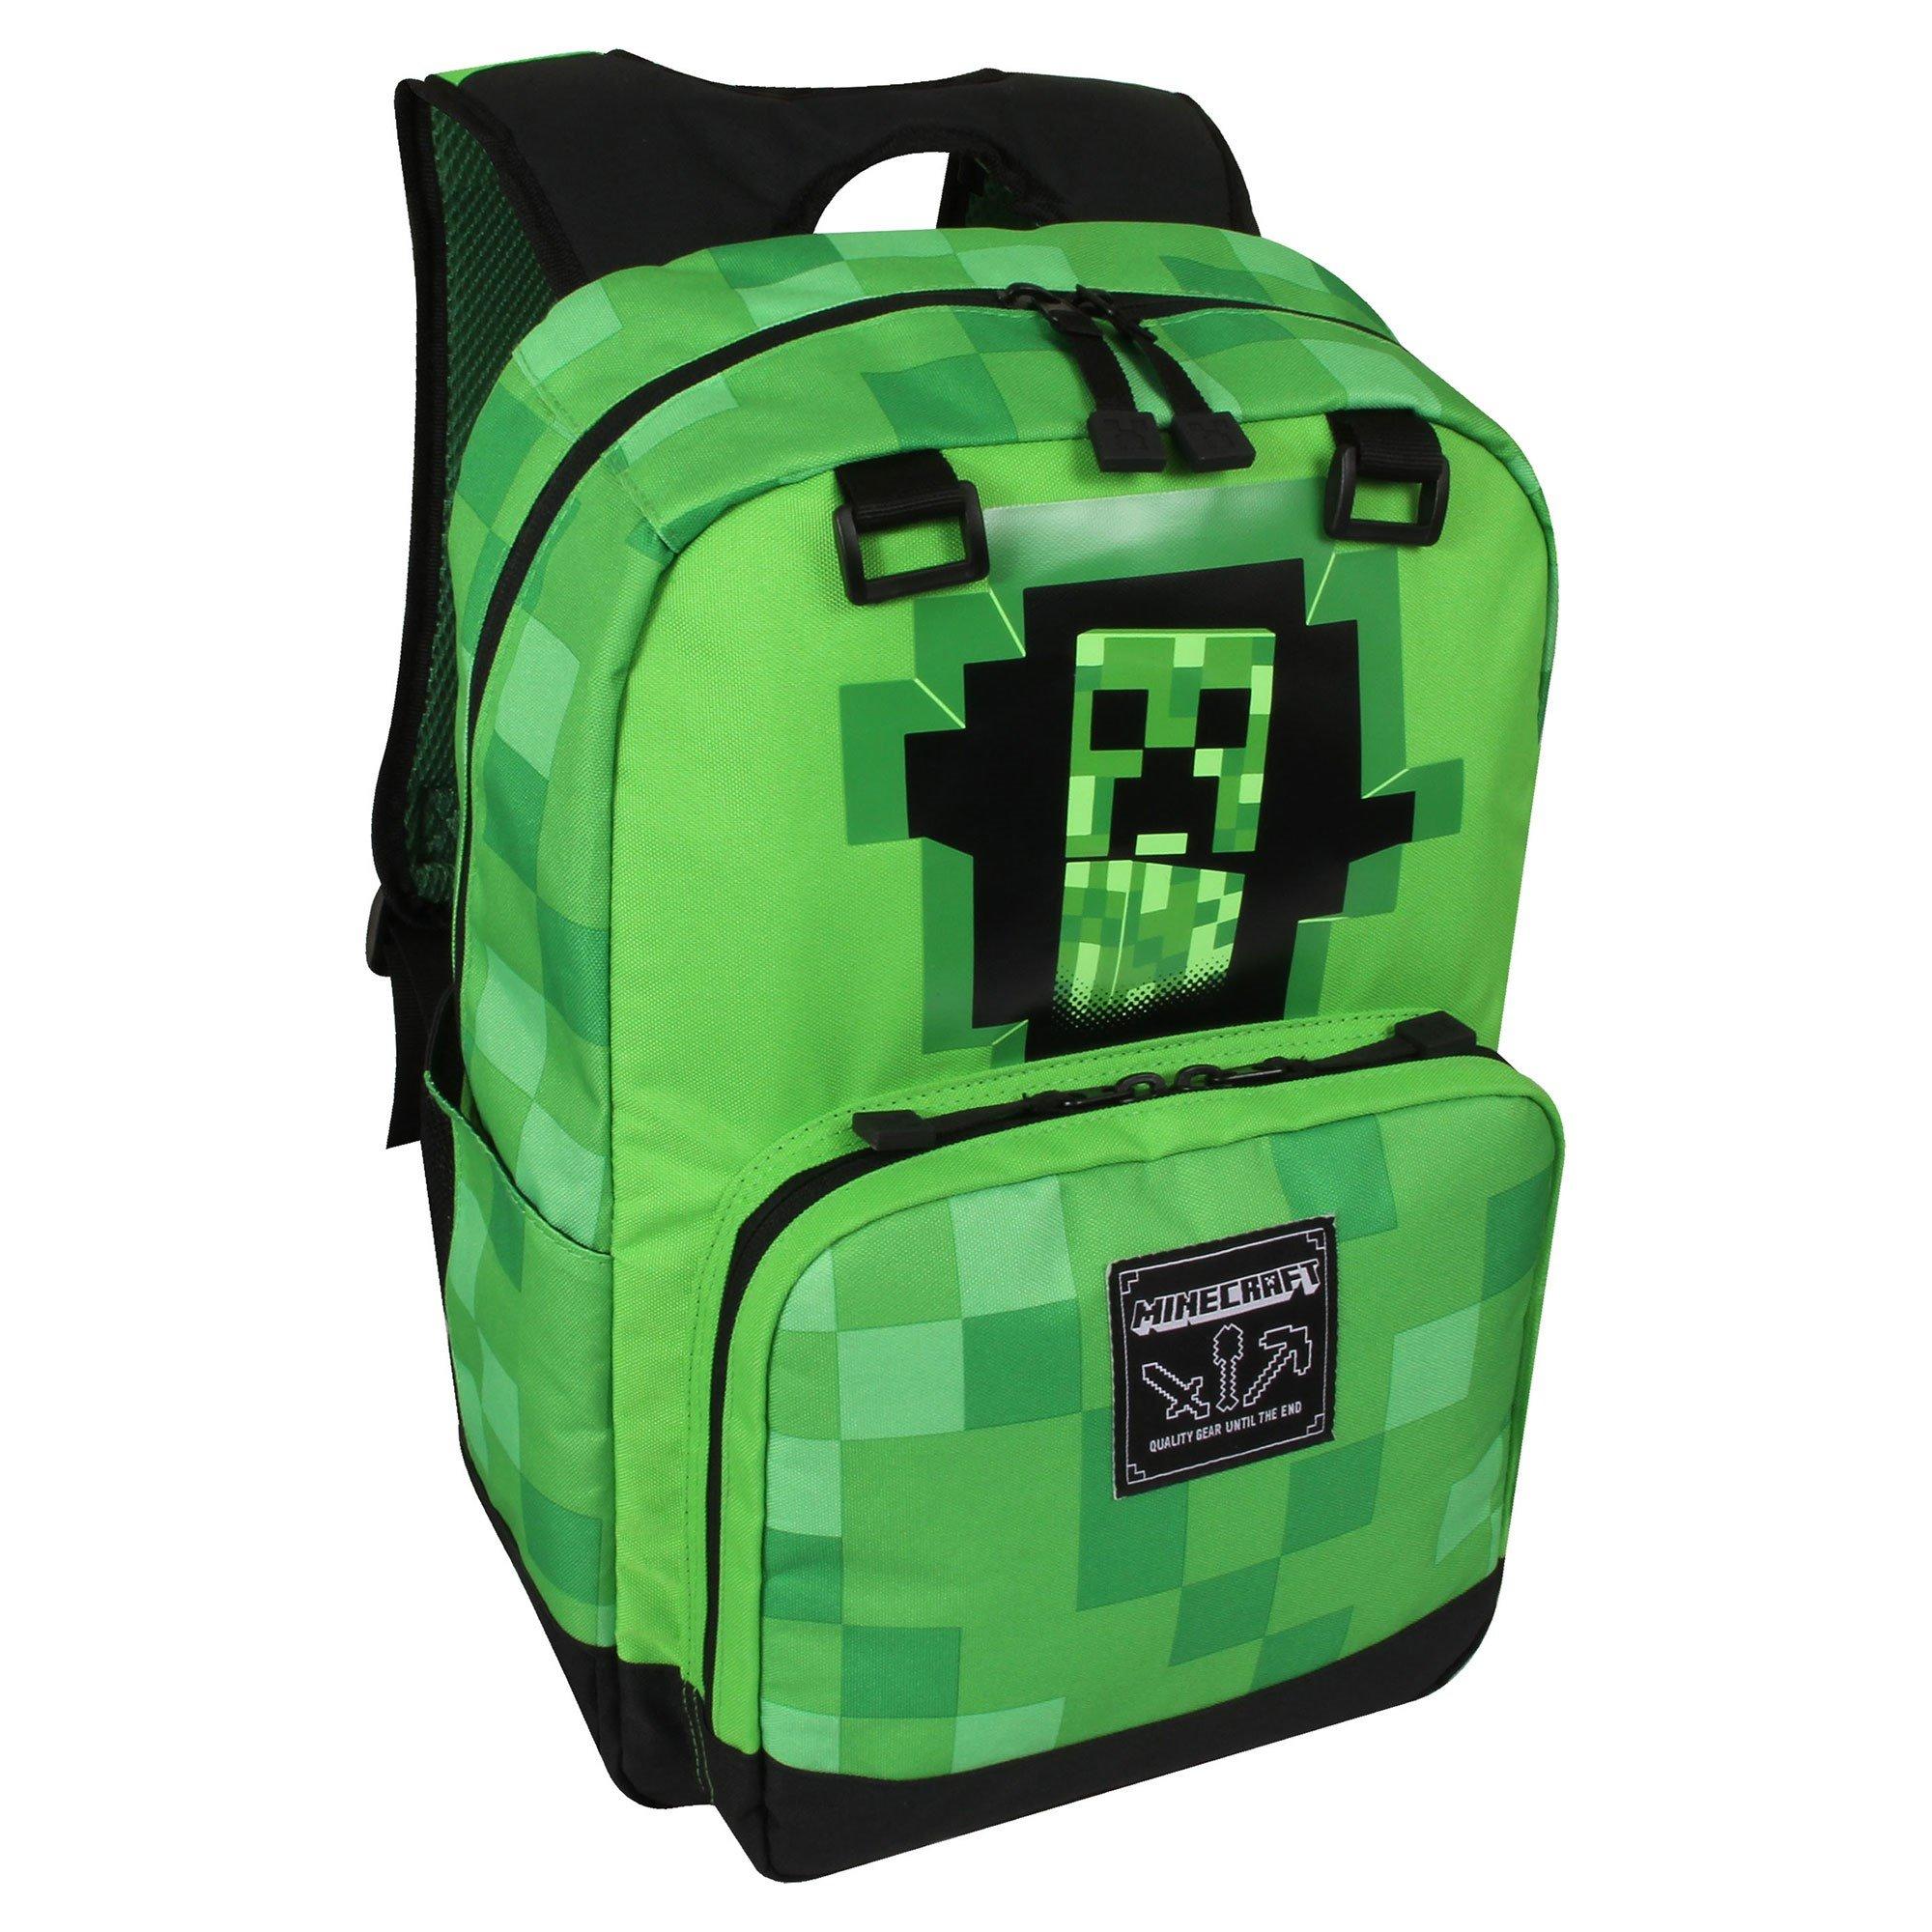 JINX Minecraft Creepy Creeper Kids School Backpack, Green, 17'' by JINX